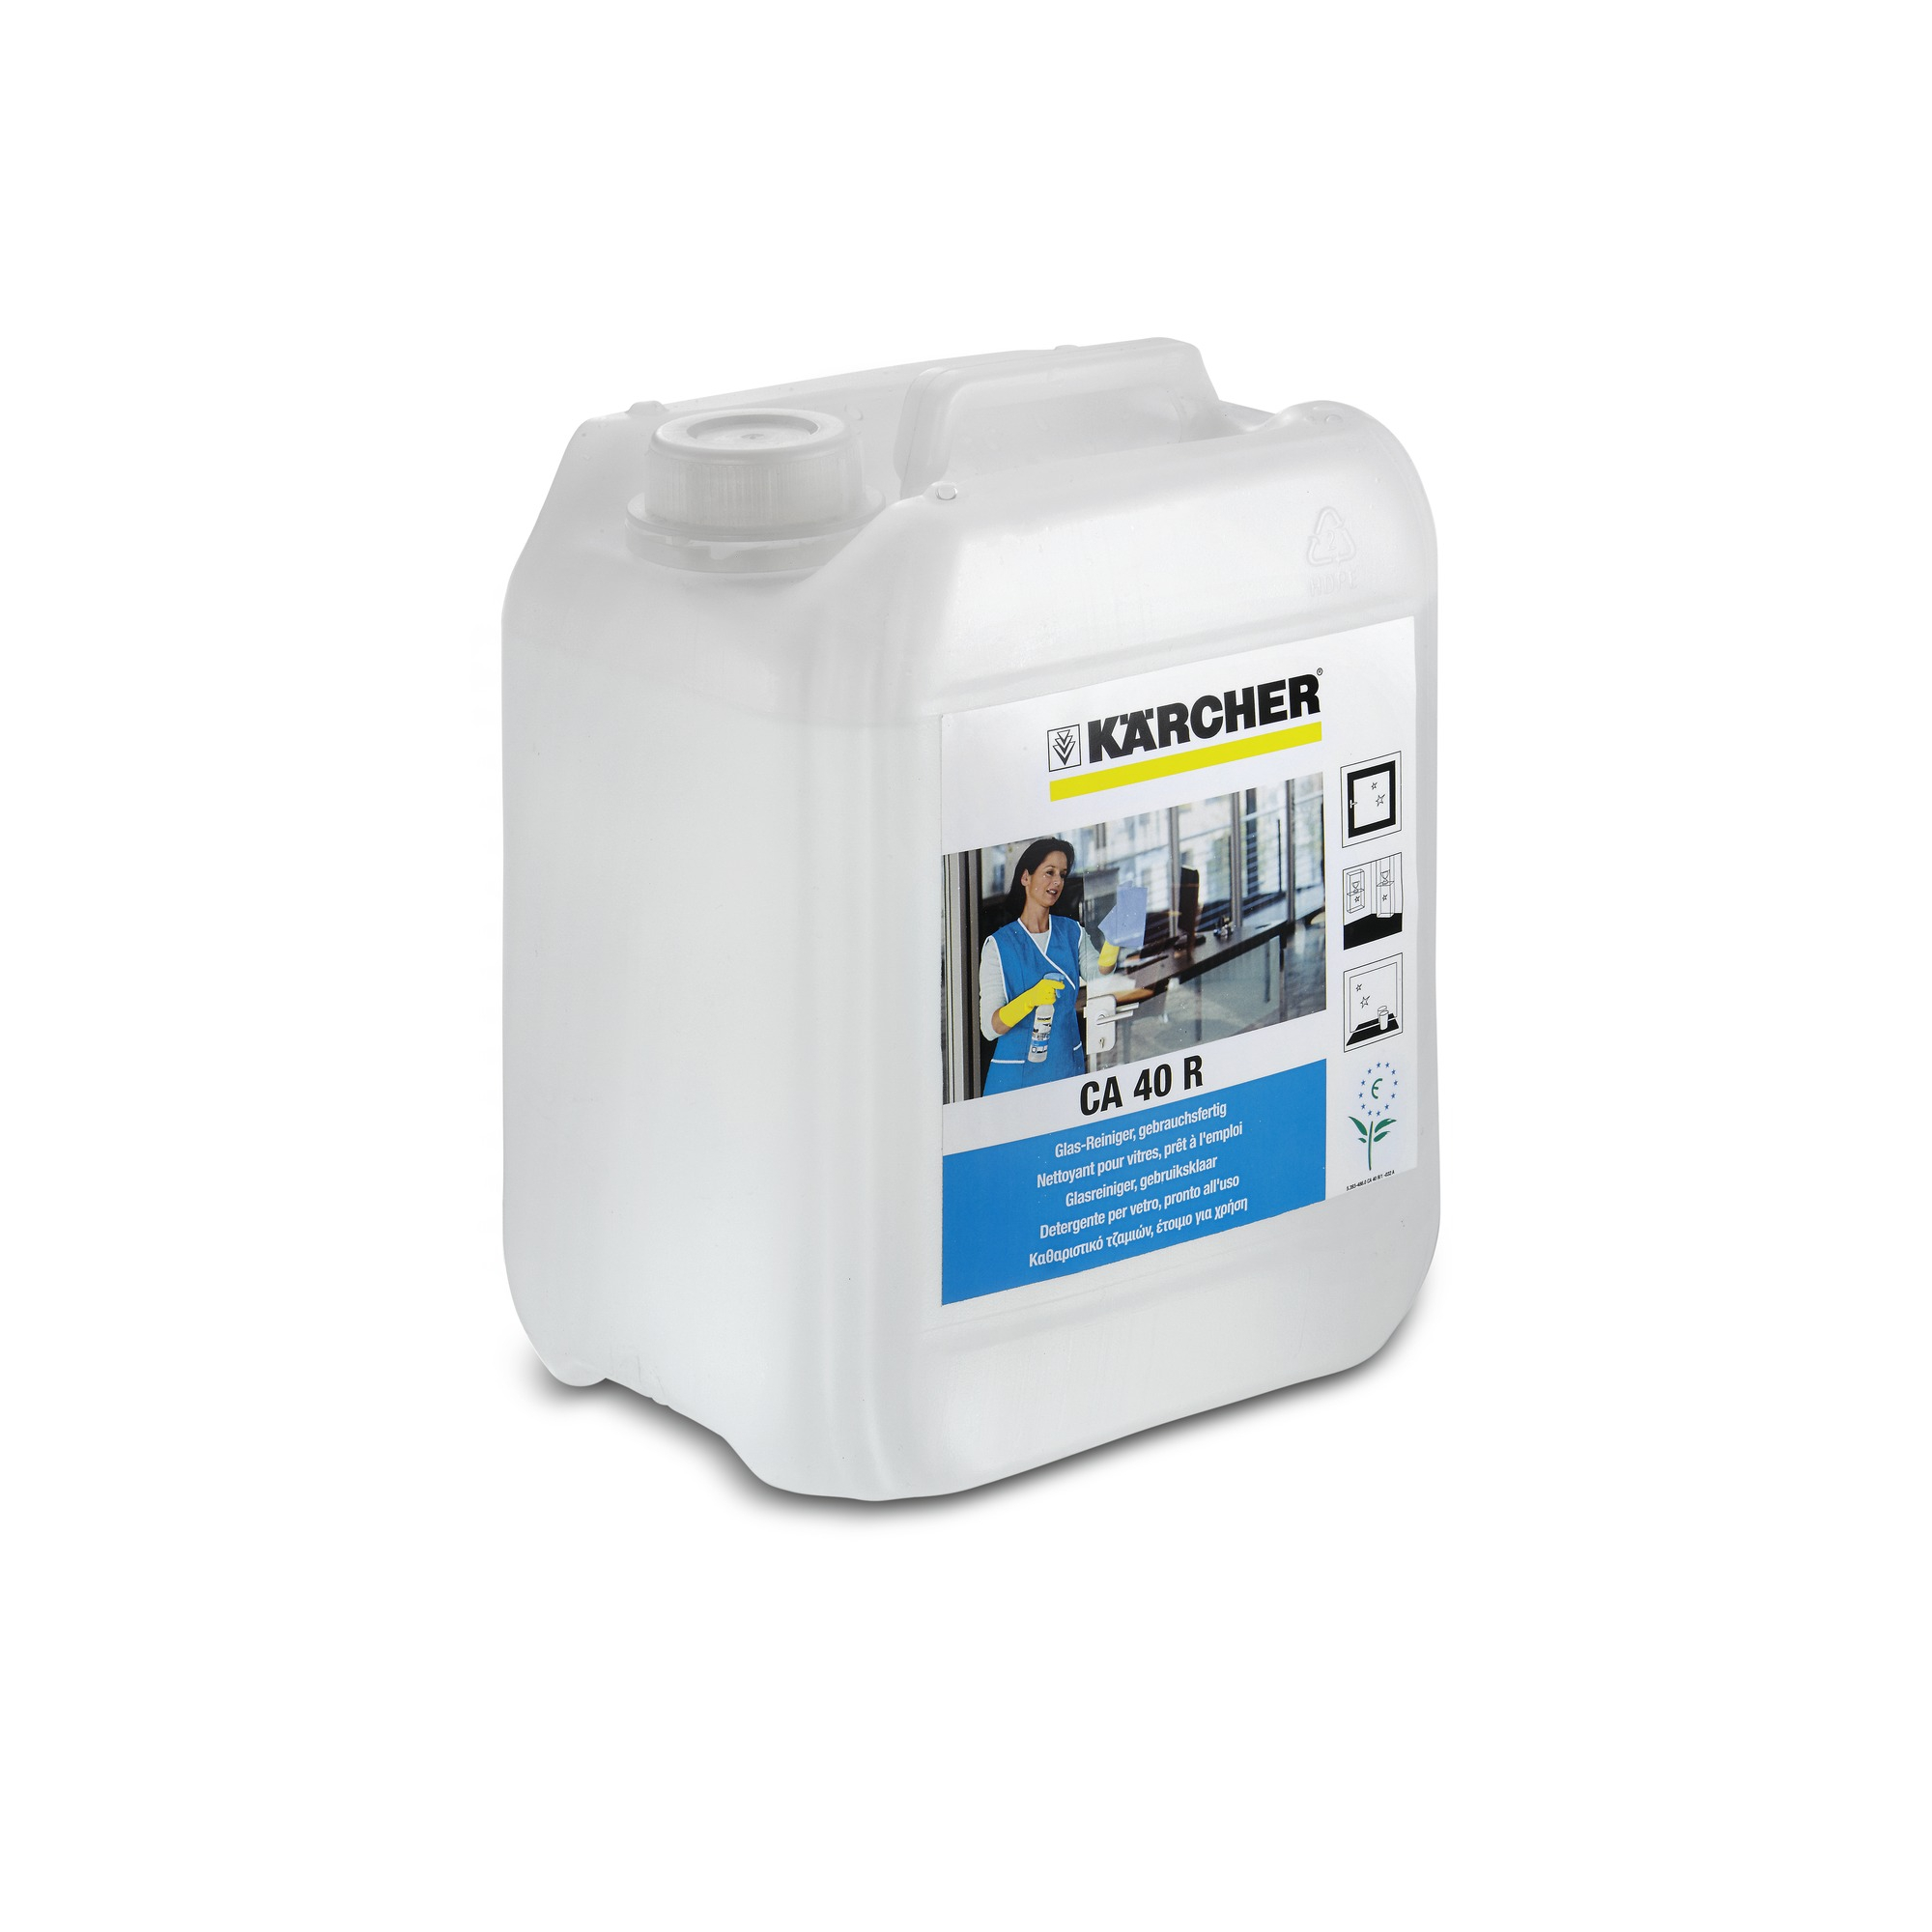 Glasreiniger, gebrauchsfertig  CA 40 R   5 l